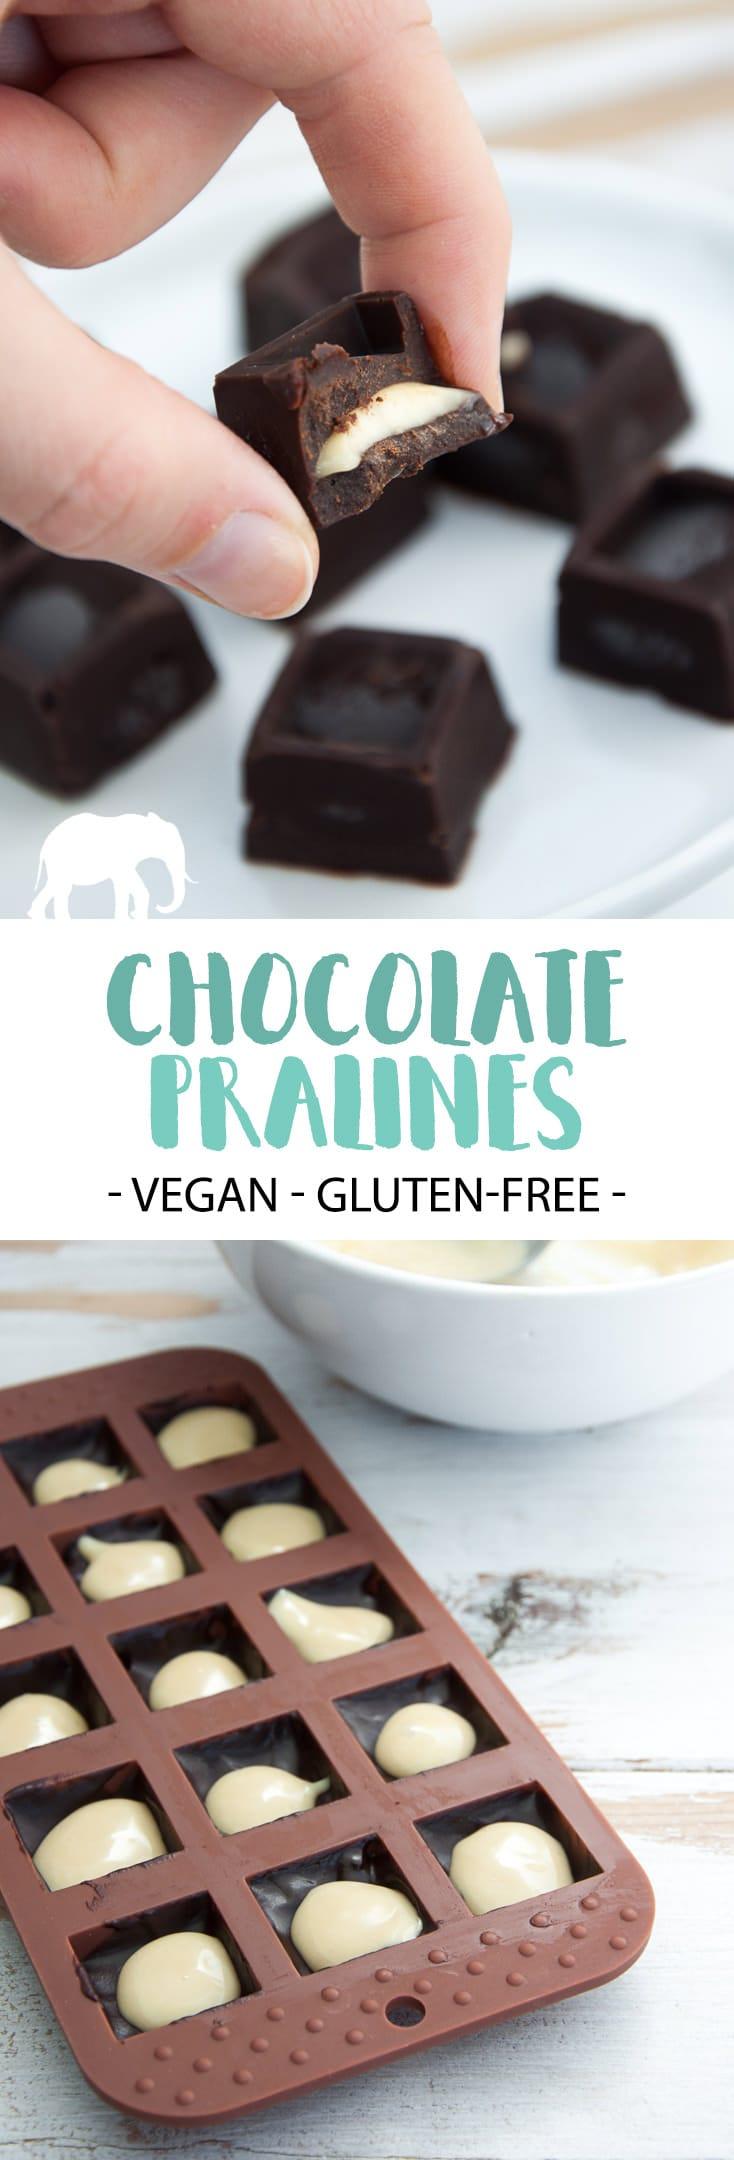 Vegan Chocolate Pralines